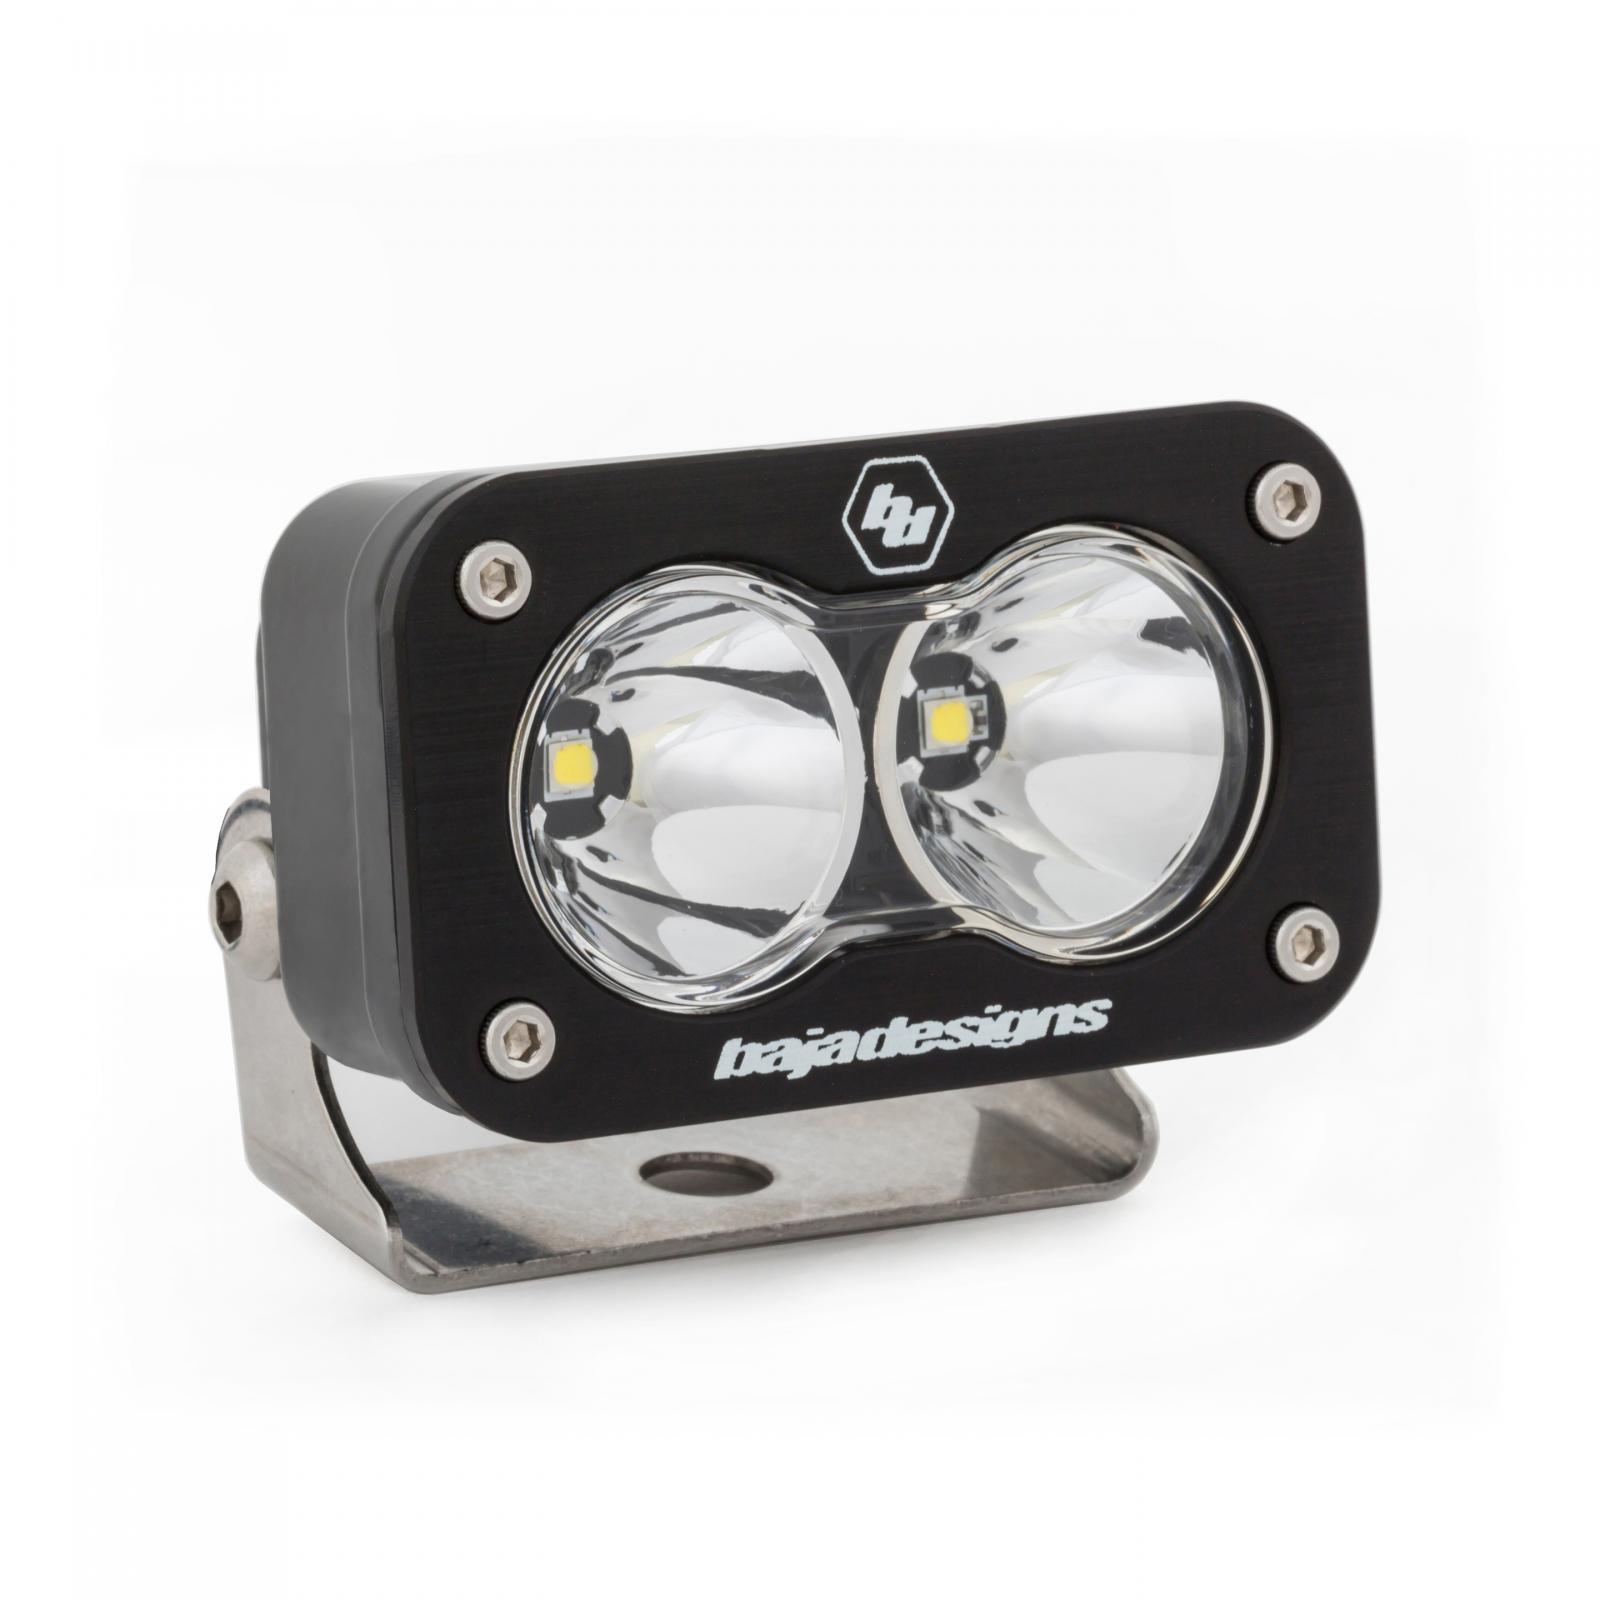 LED Work Light Clear Lens Spot Pattern Each S2 Sport Baja Designs